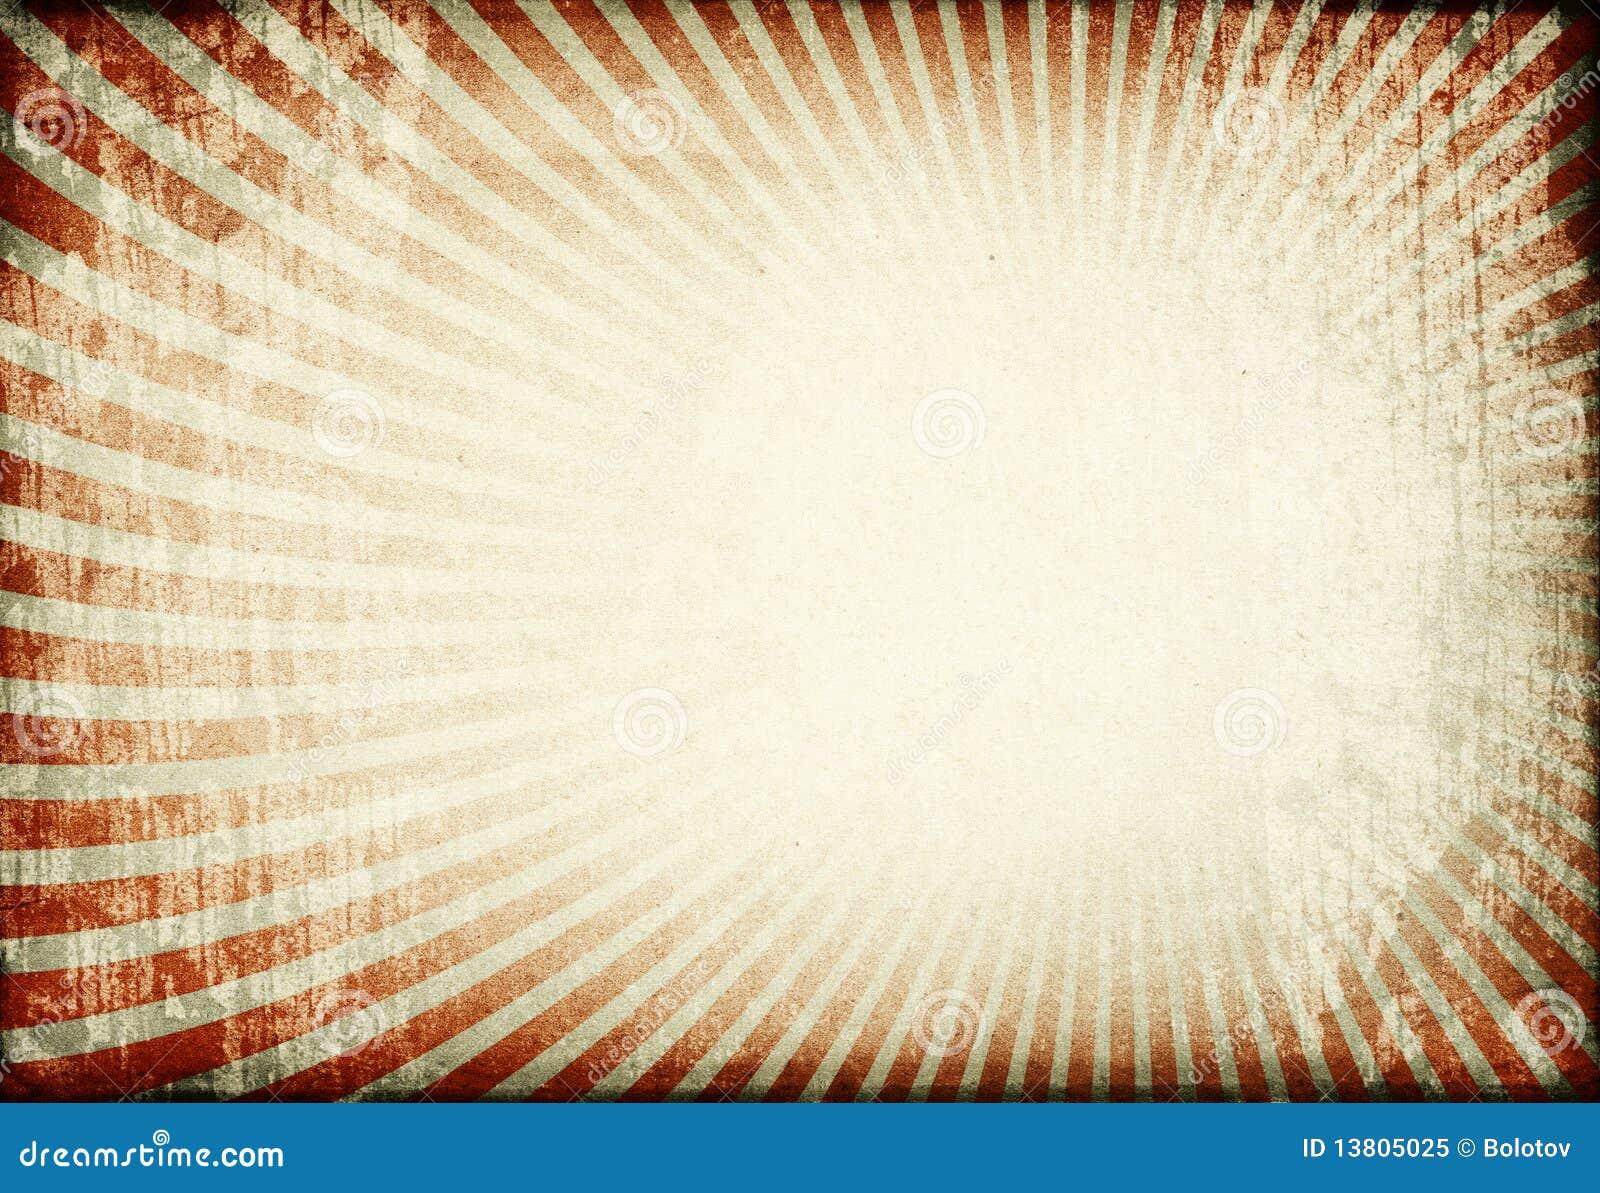 sunburst image on old grunge paper background  royalty